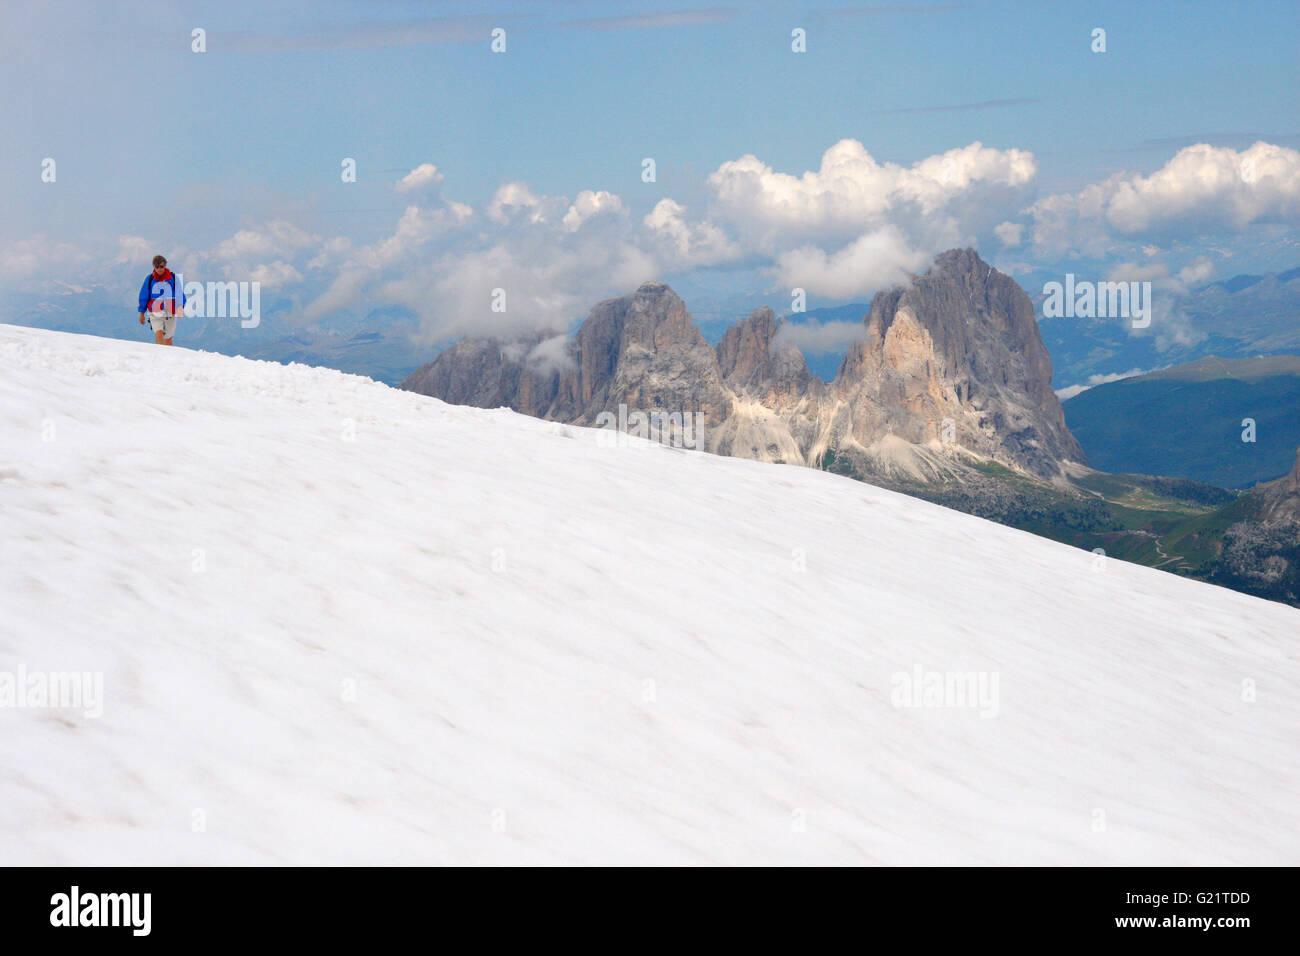 Marmolada, Dolomiten, Italien. - Stock Image